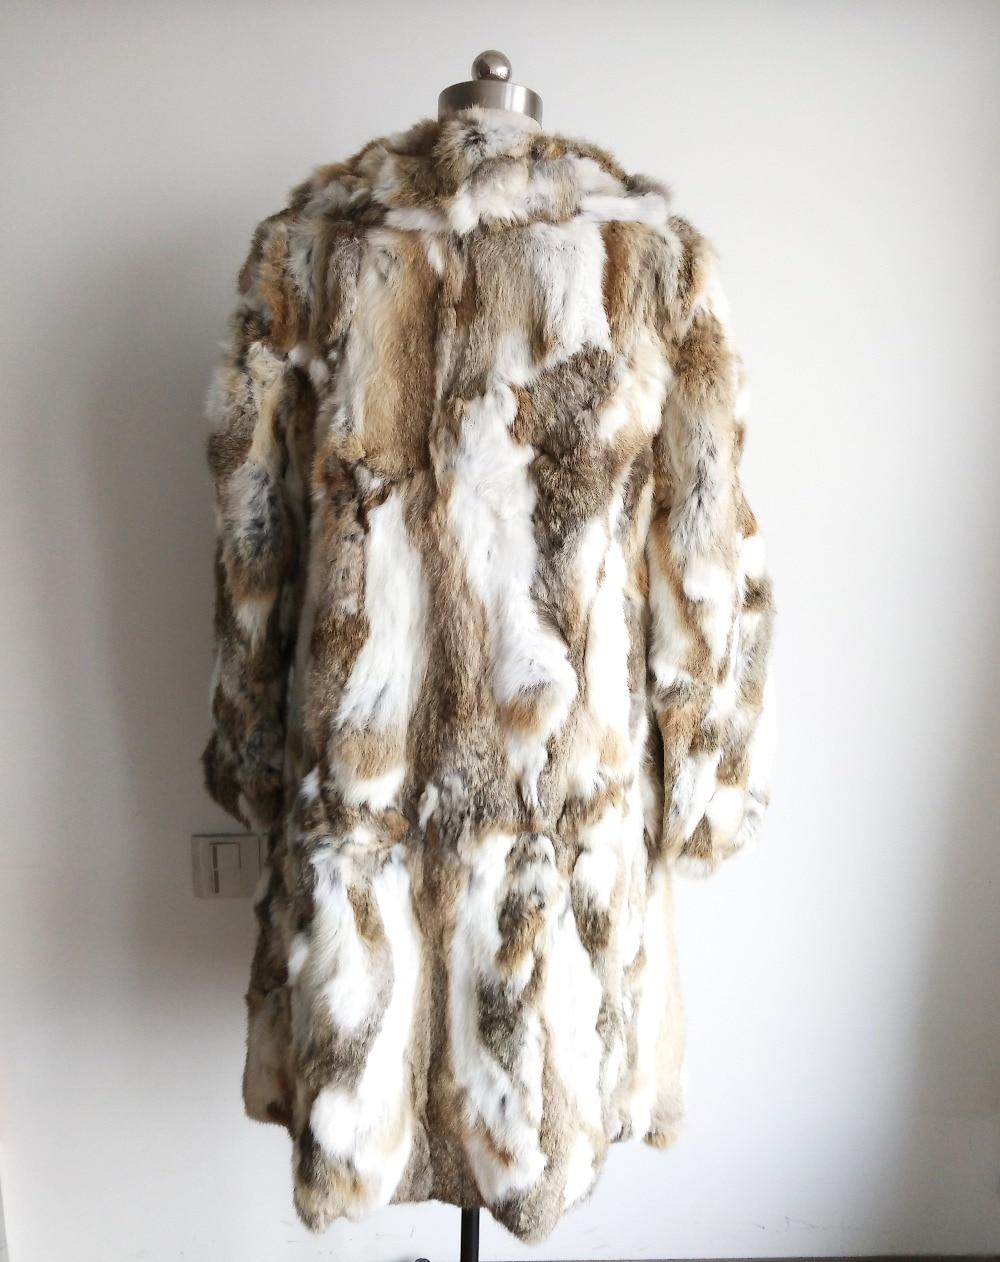 2019 Turn Down Collar Plus Big Longer Size 1m Long Coat 100% Genuine Real Rabbit Fur Overcoat Women Warm Outwear SR130